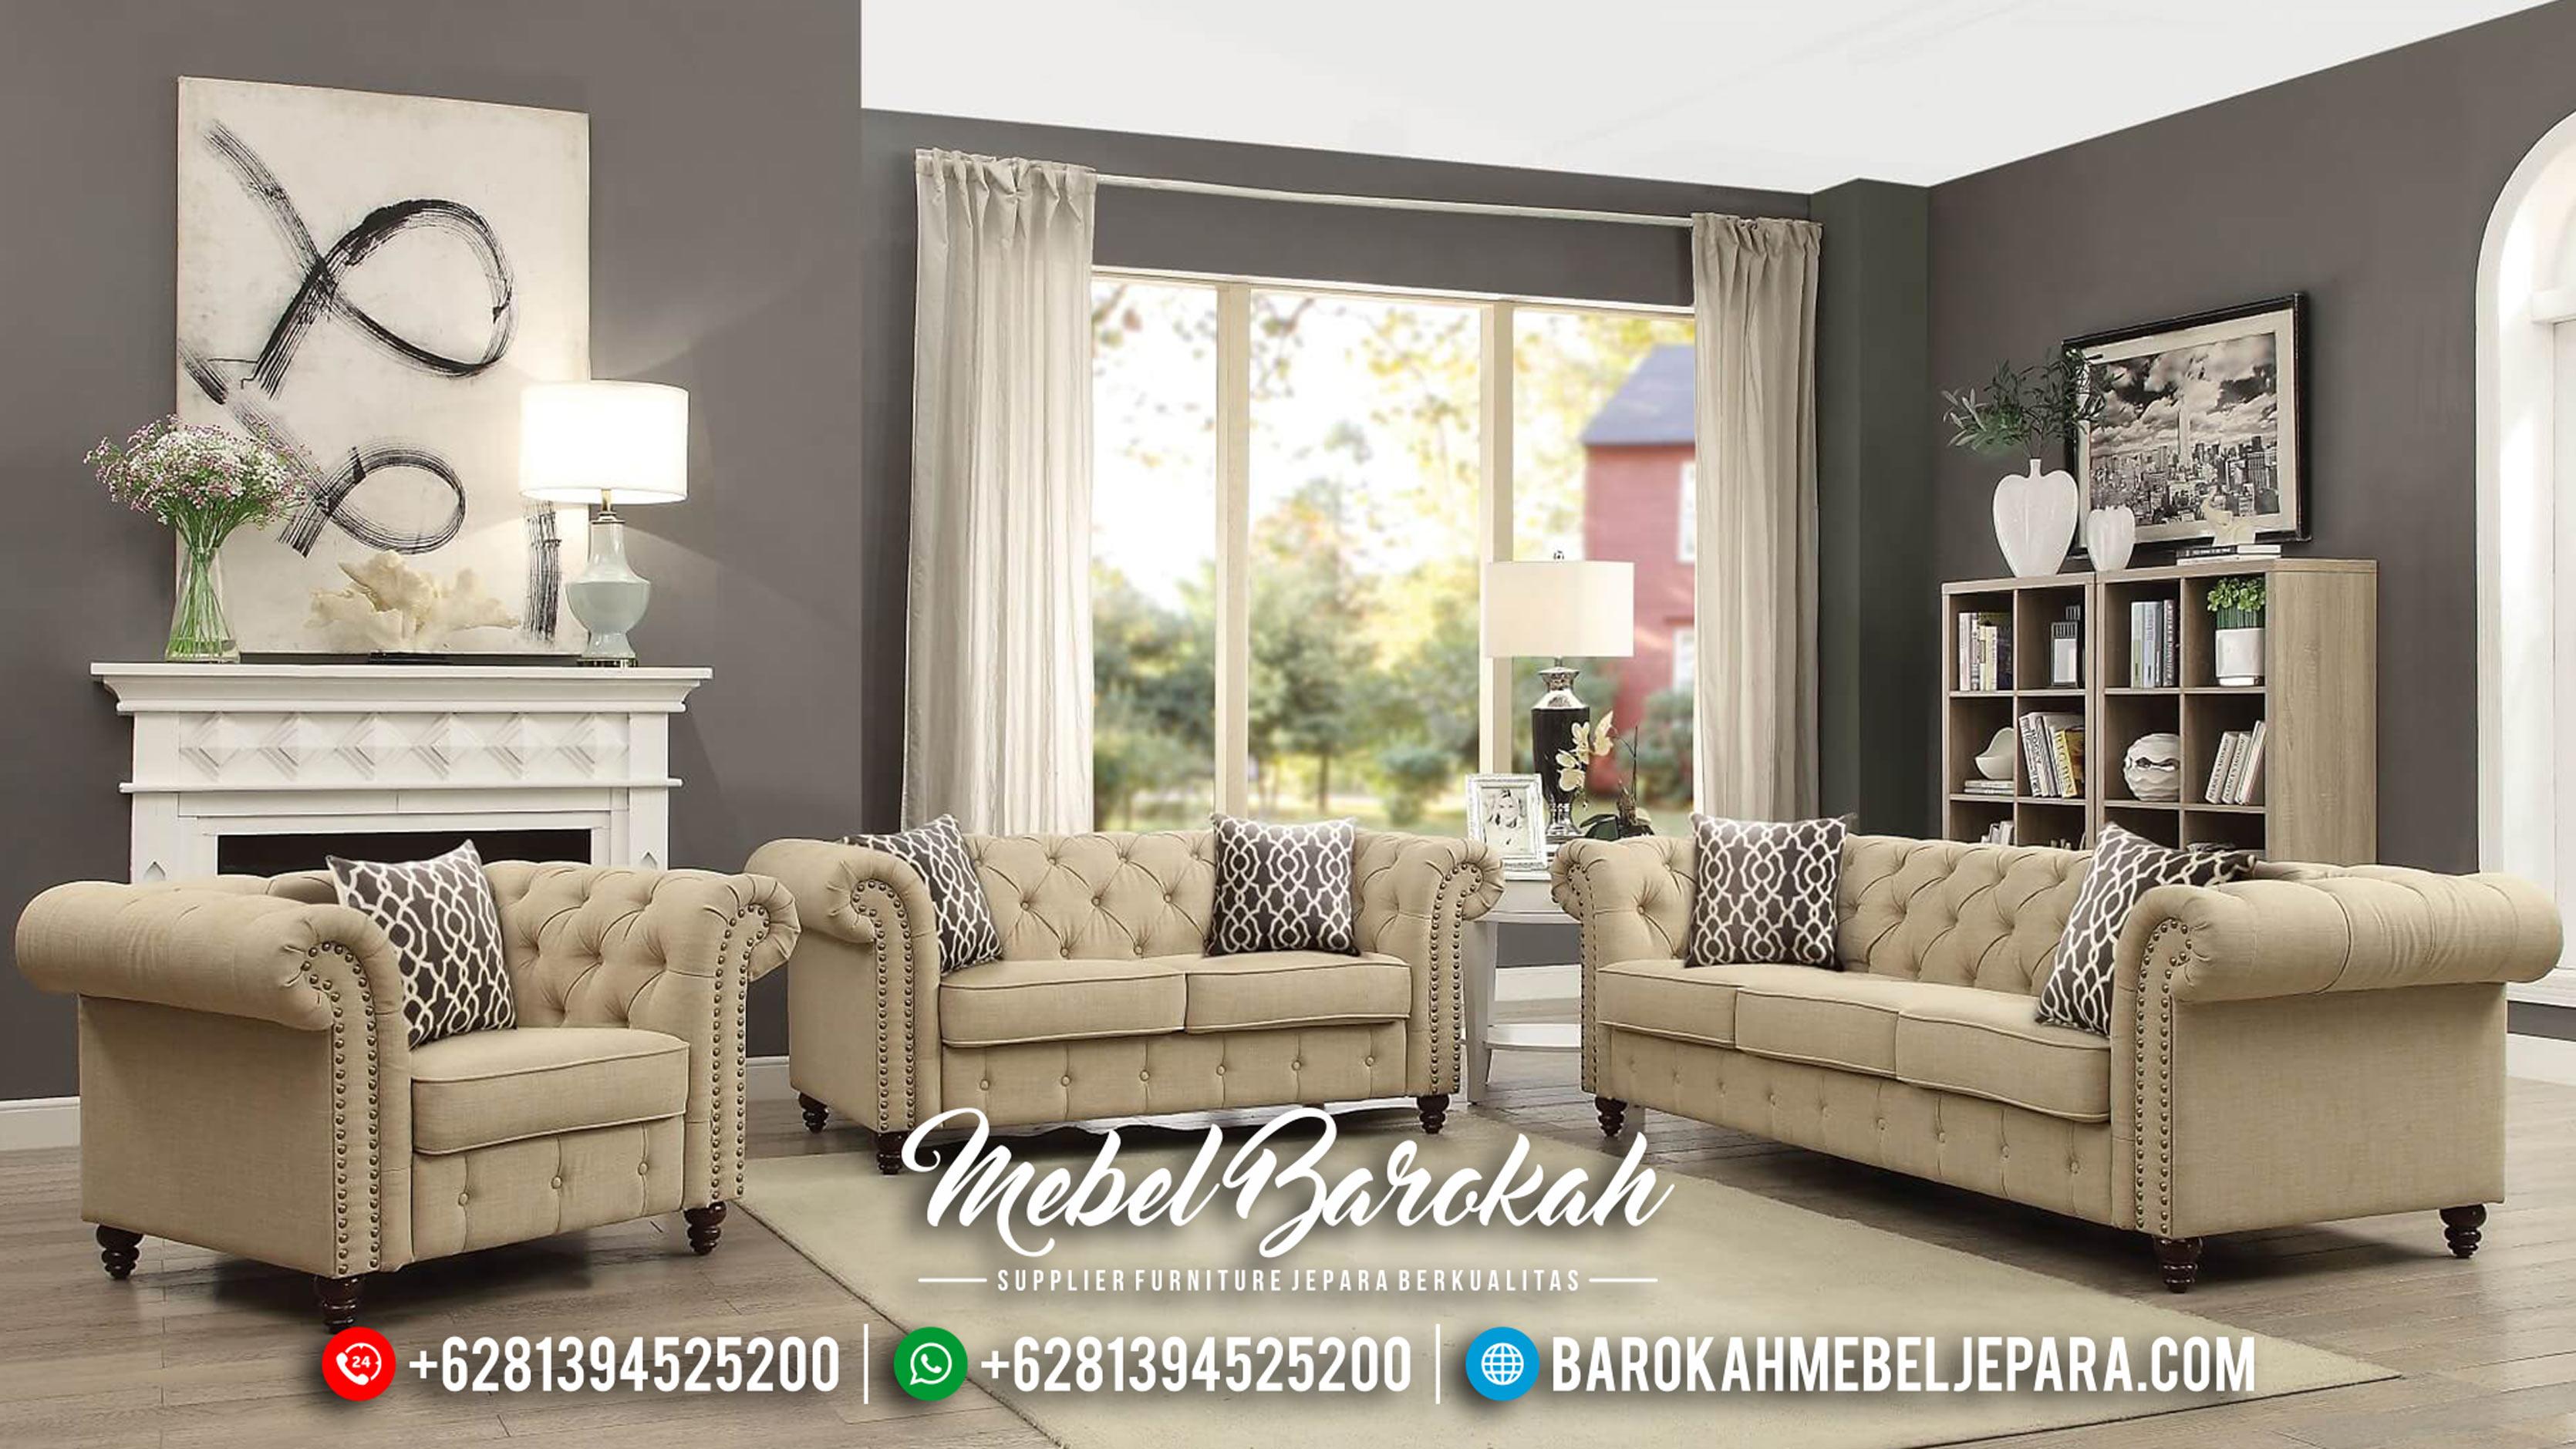 New Sofa Minimalis Chesterfield Mebel Jepara MB-0325